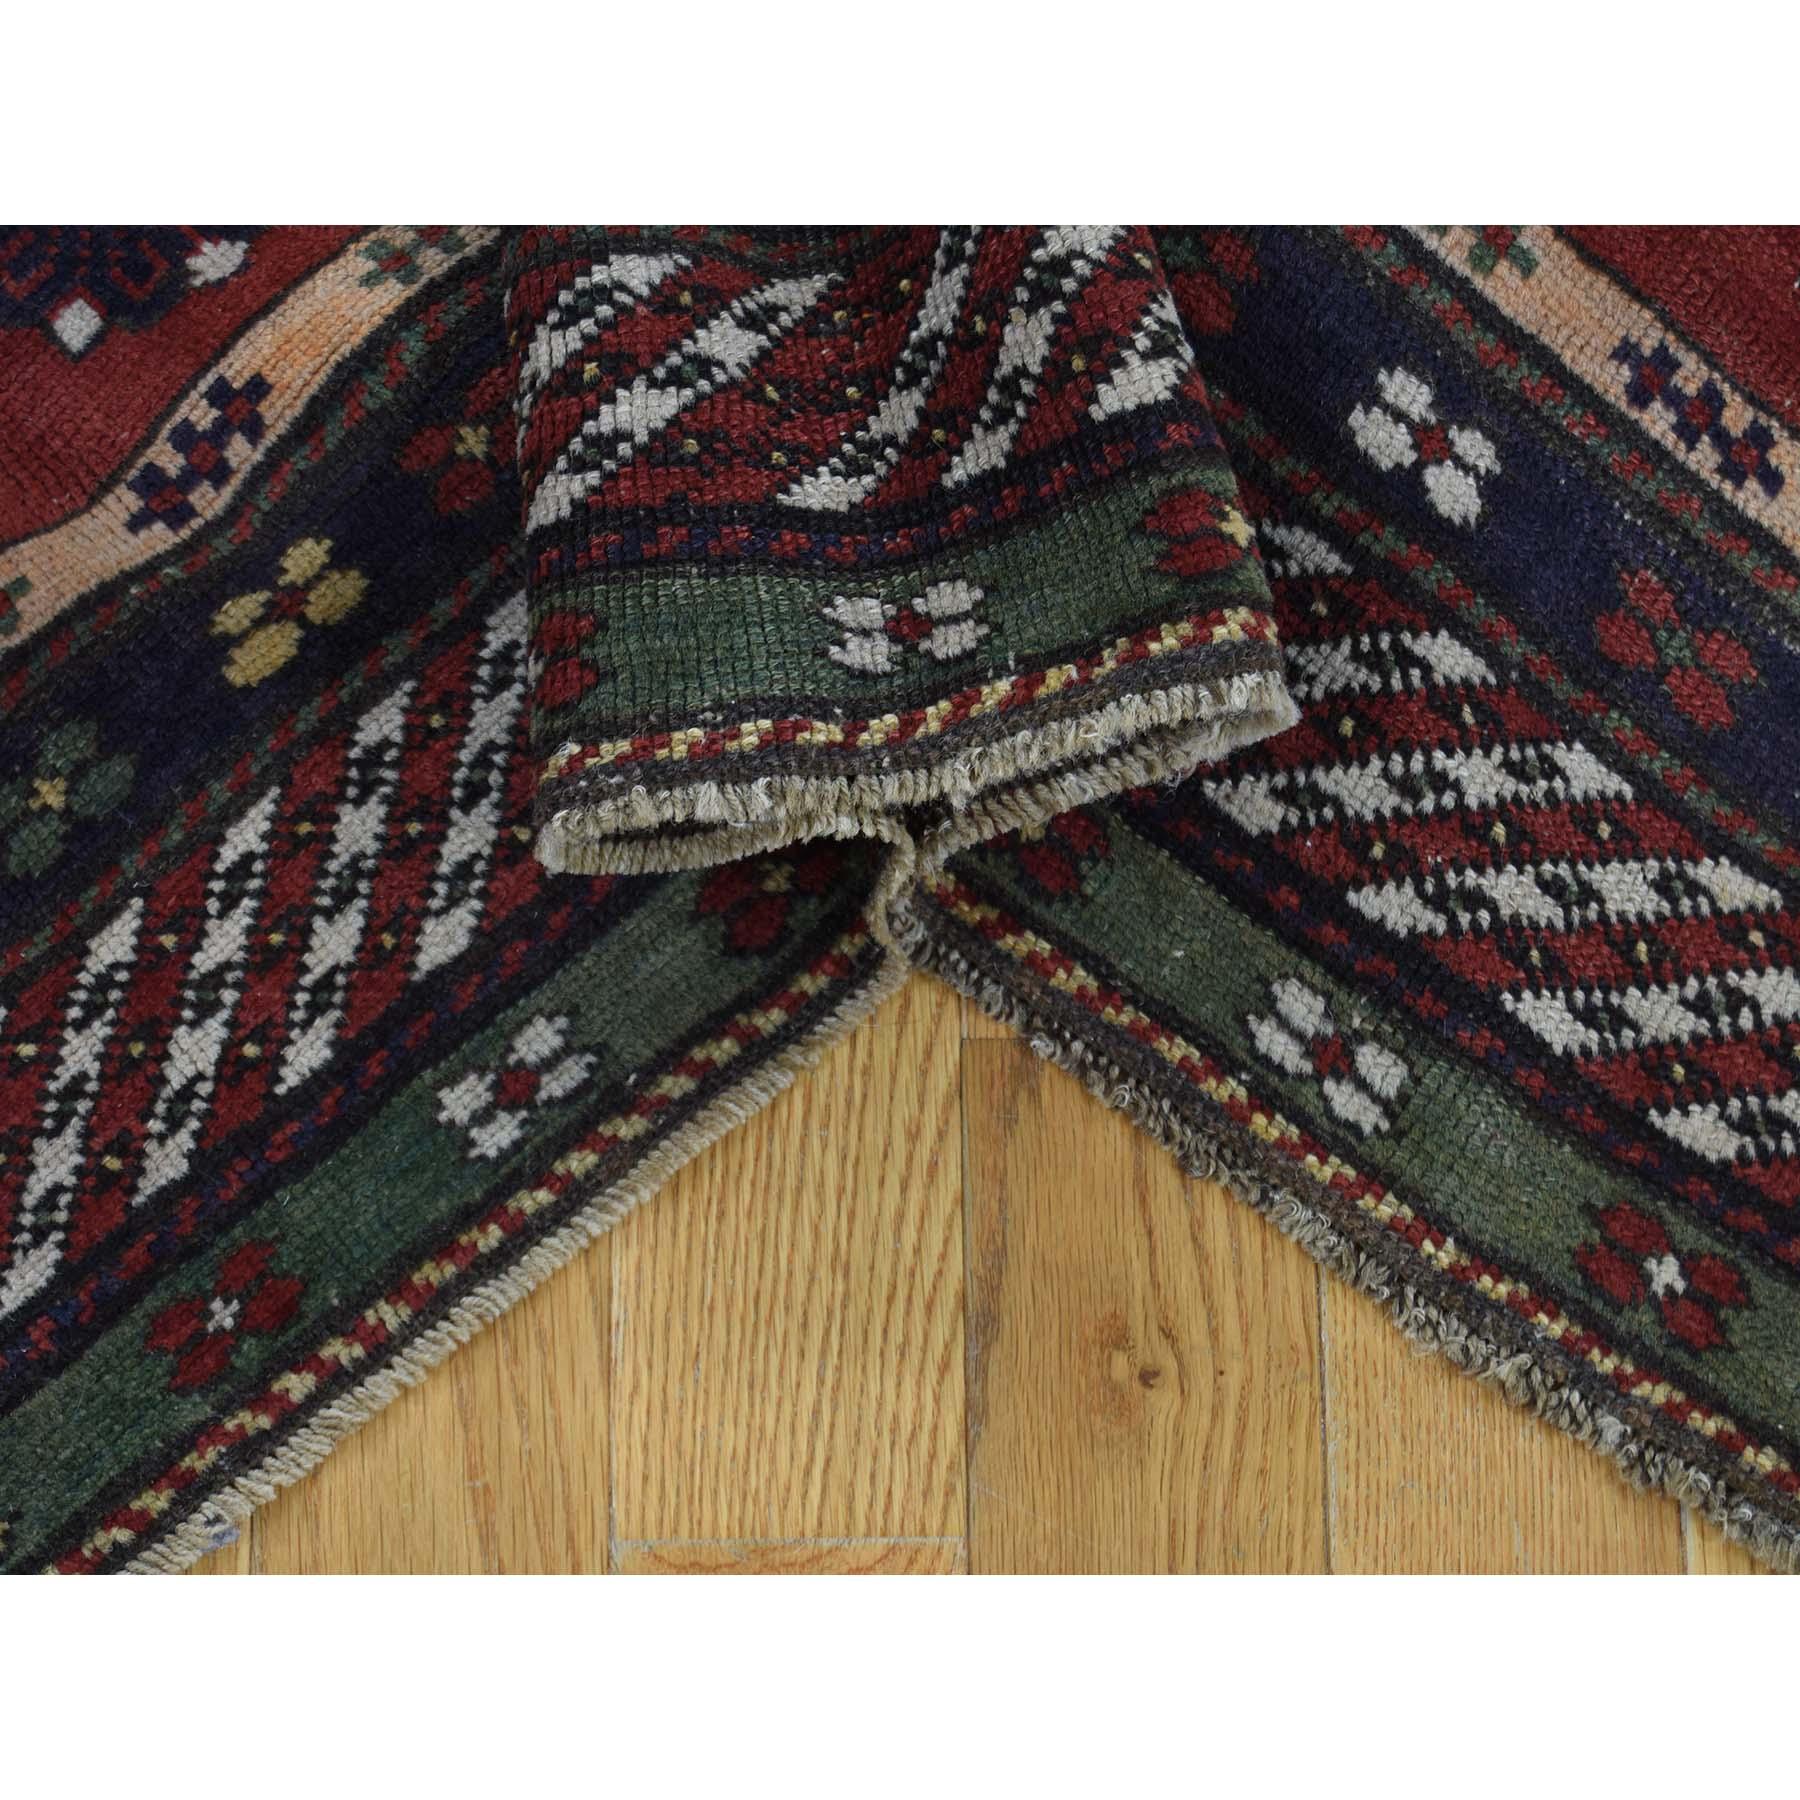 5-9 x8-5  Antique Caucasian Kazak Good Condition Hand Knotted Rug